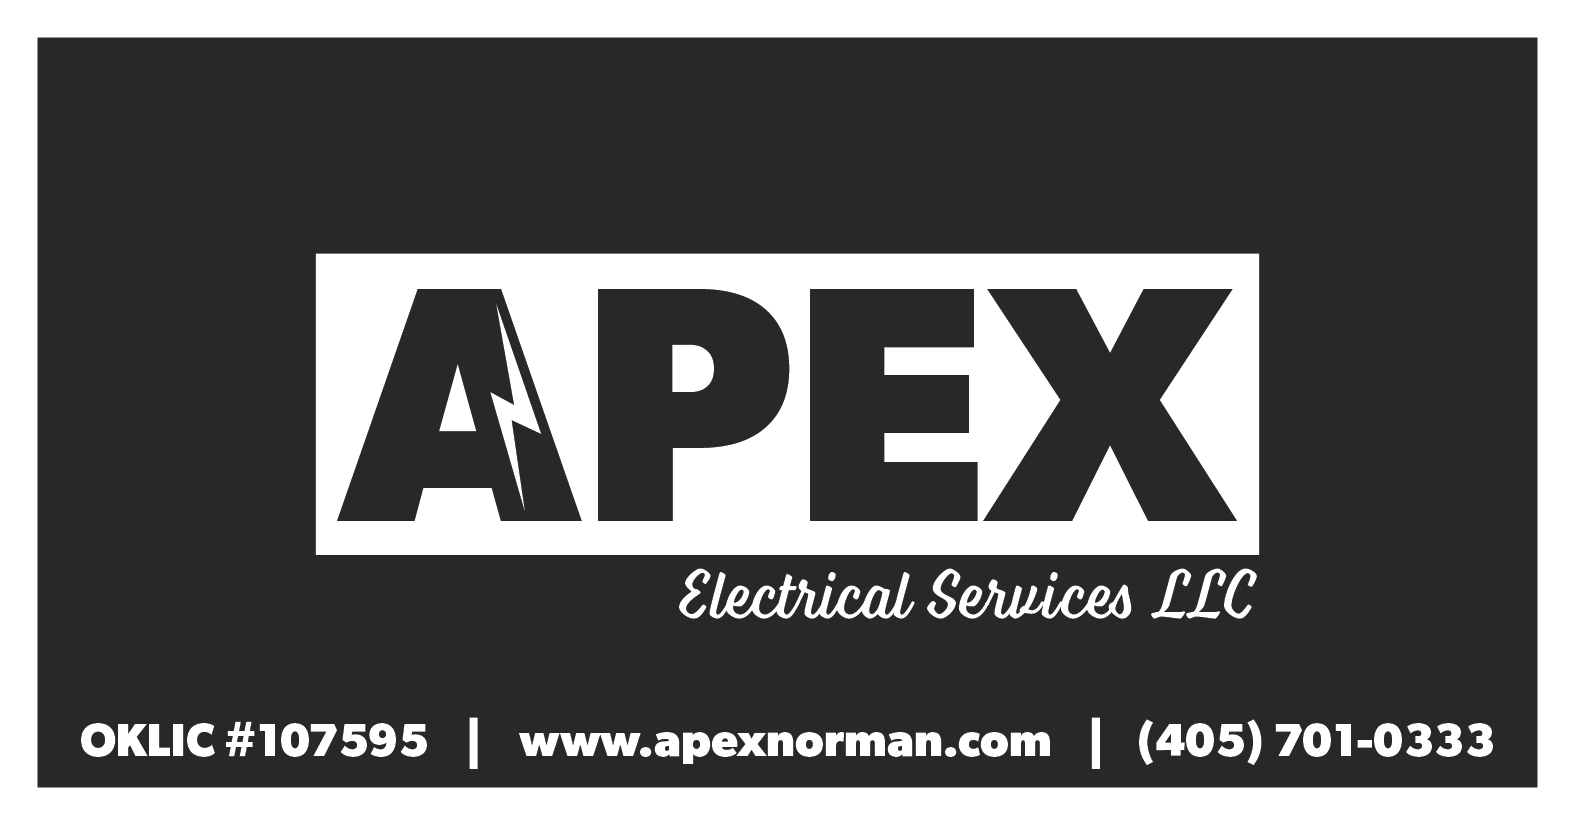 Apex Electrical Services Llc